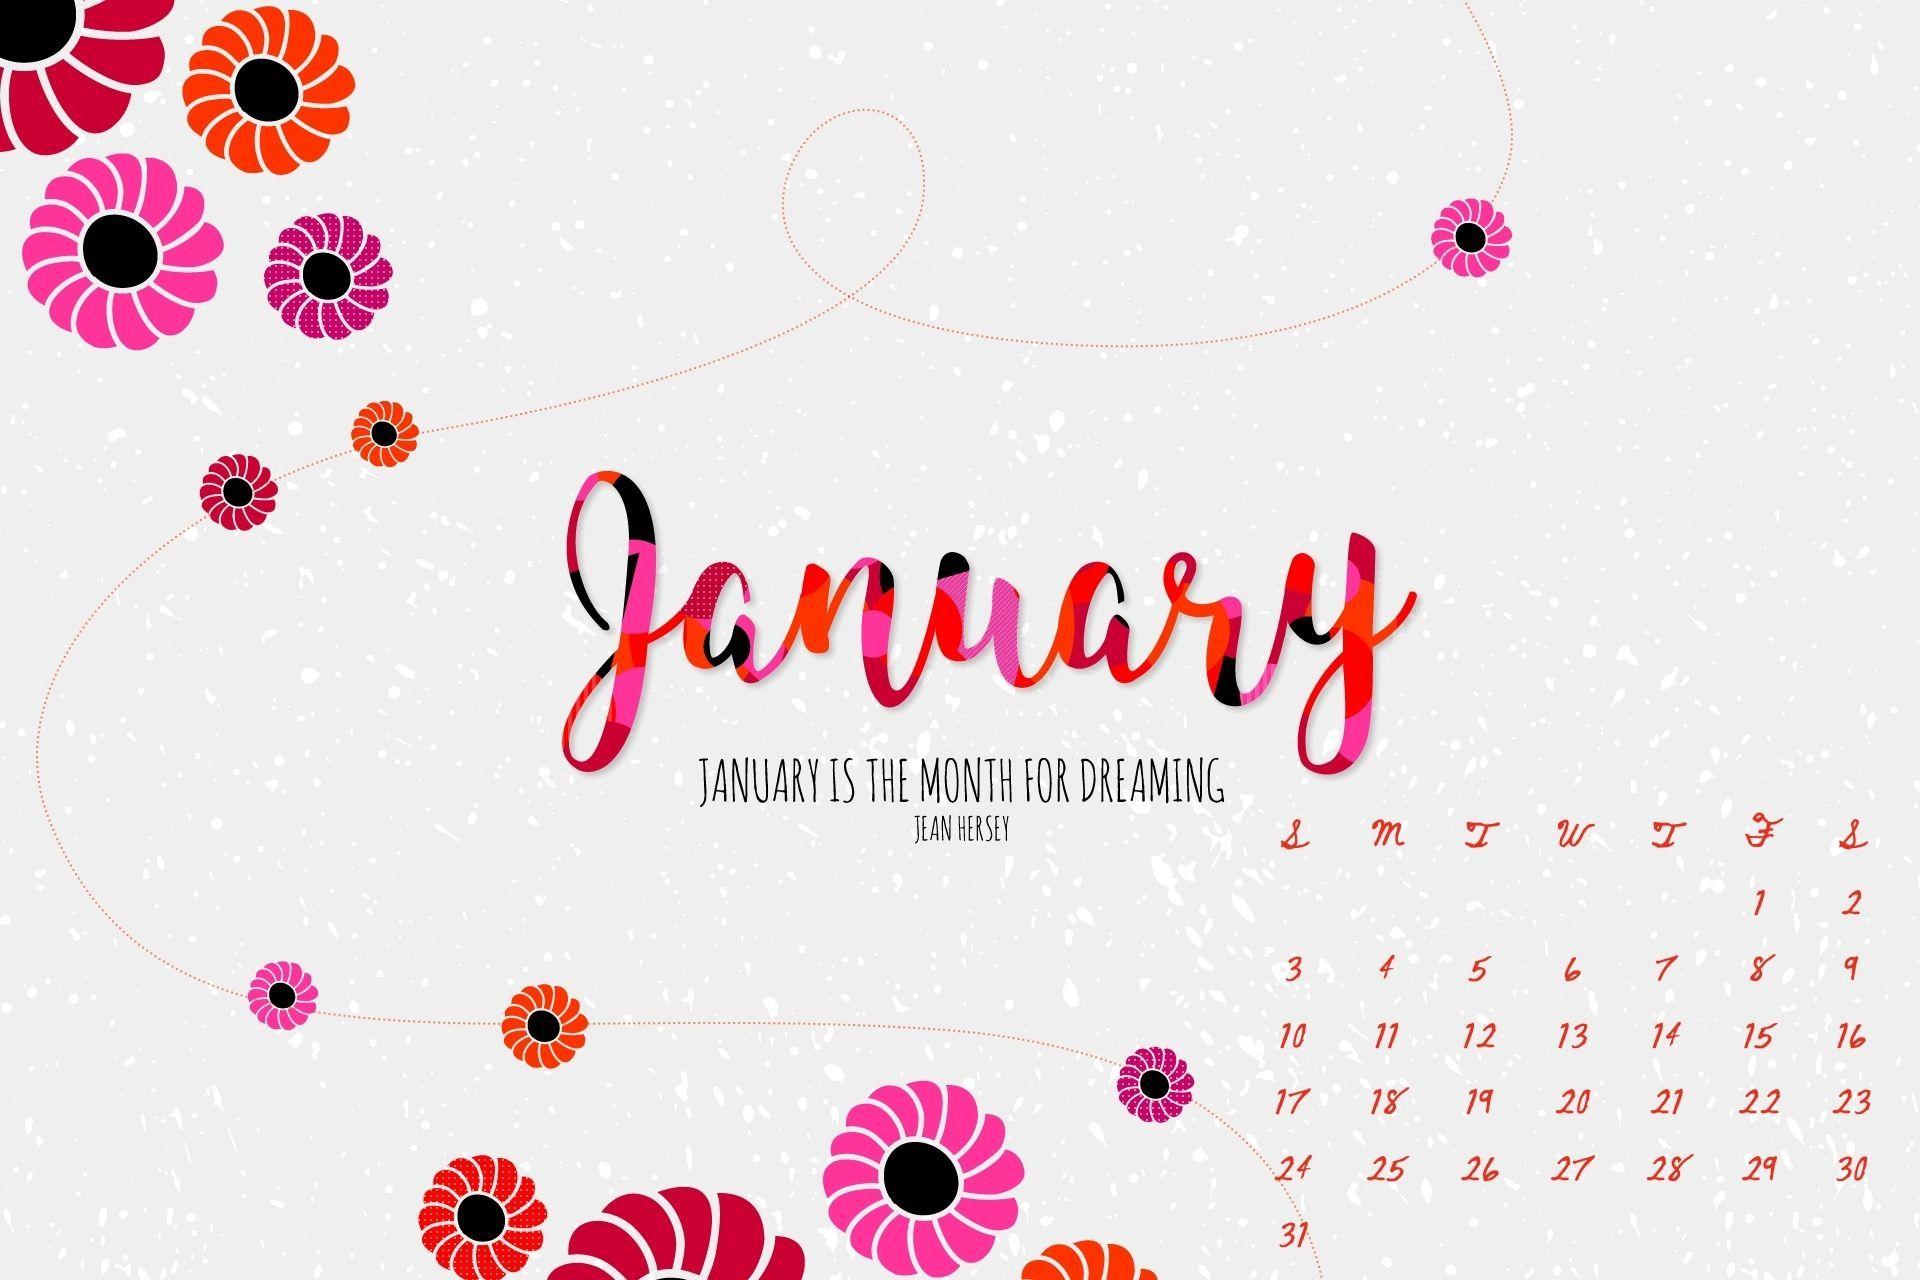 January 2021 Calendar Wallpapers Free Download Calendar 2021 In 2021 Calendar Wallpaper Free Printable Calendar Templates Floral Wallpaper